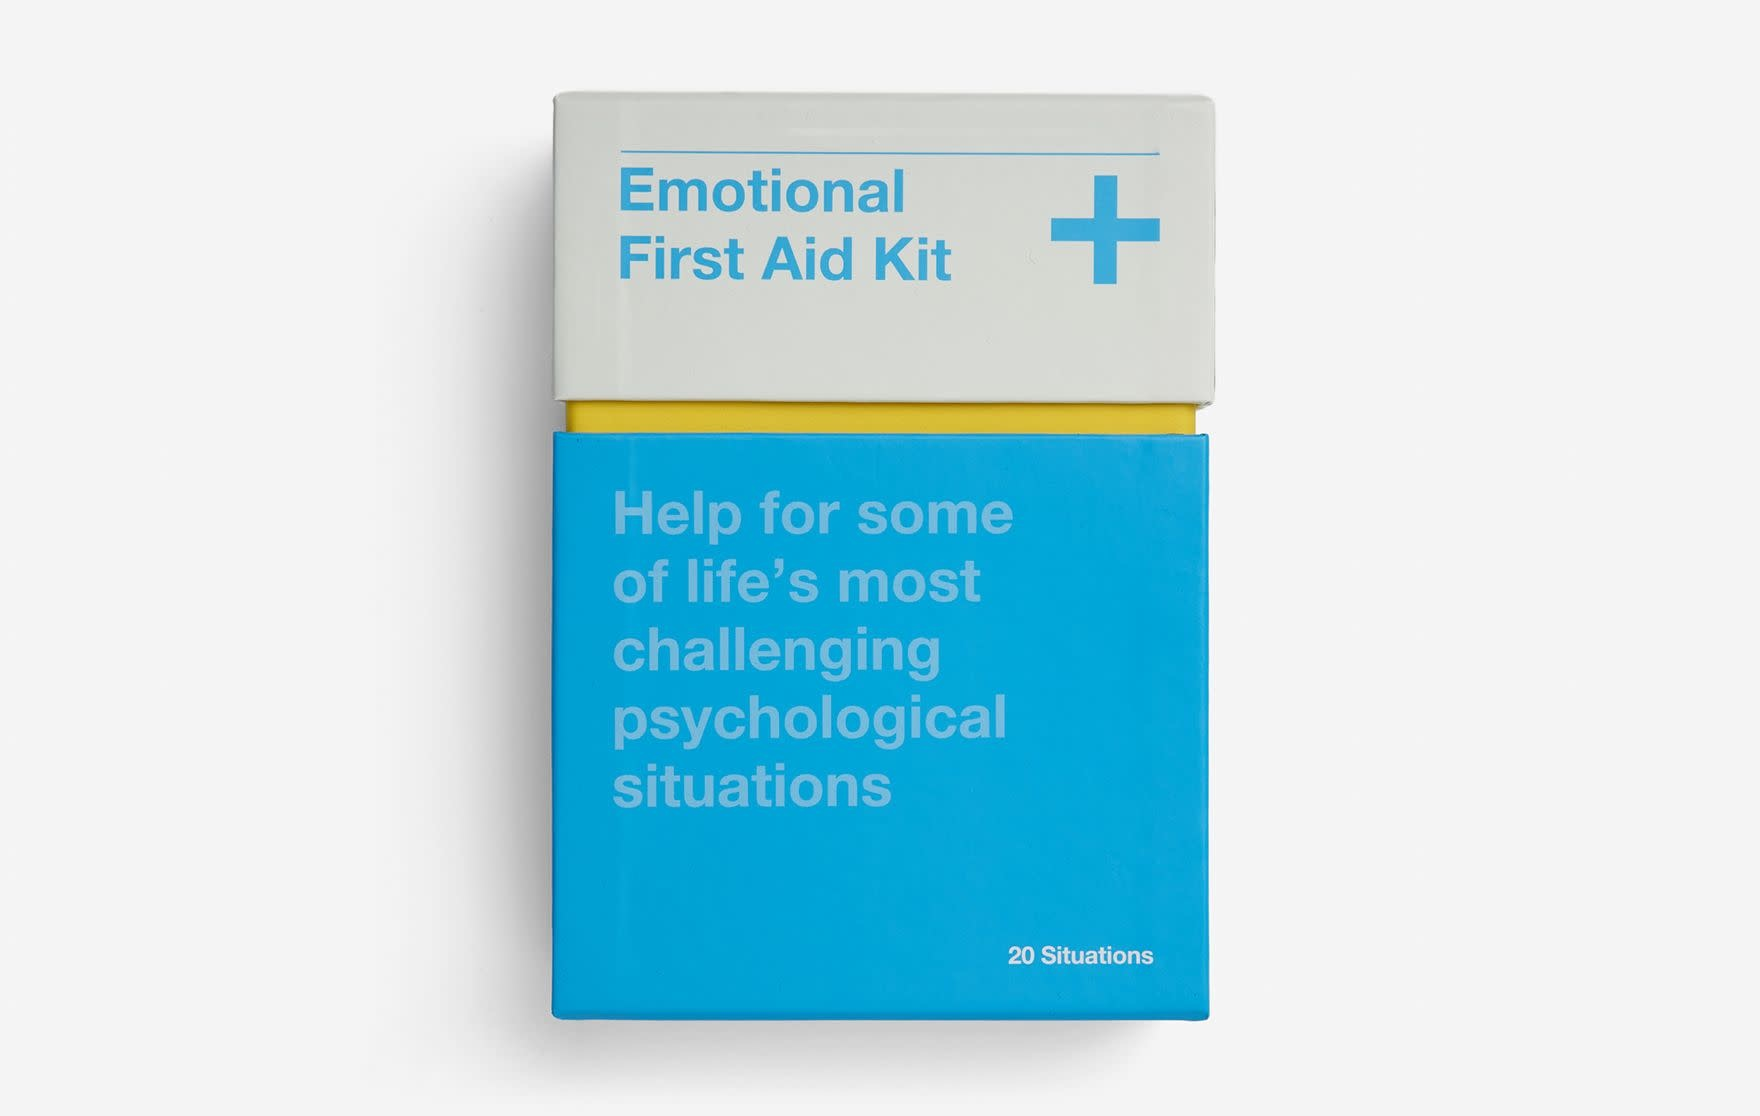 School of Life Card Set - Emotional First Aid